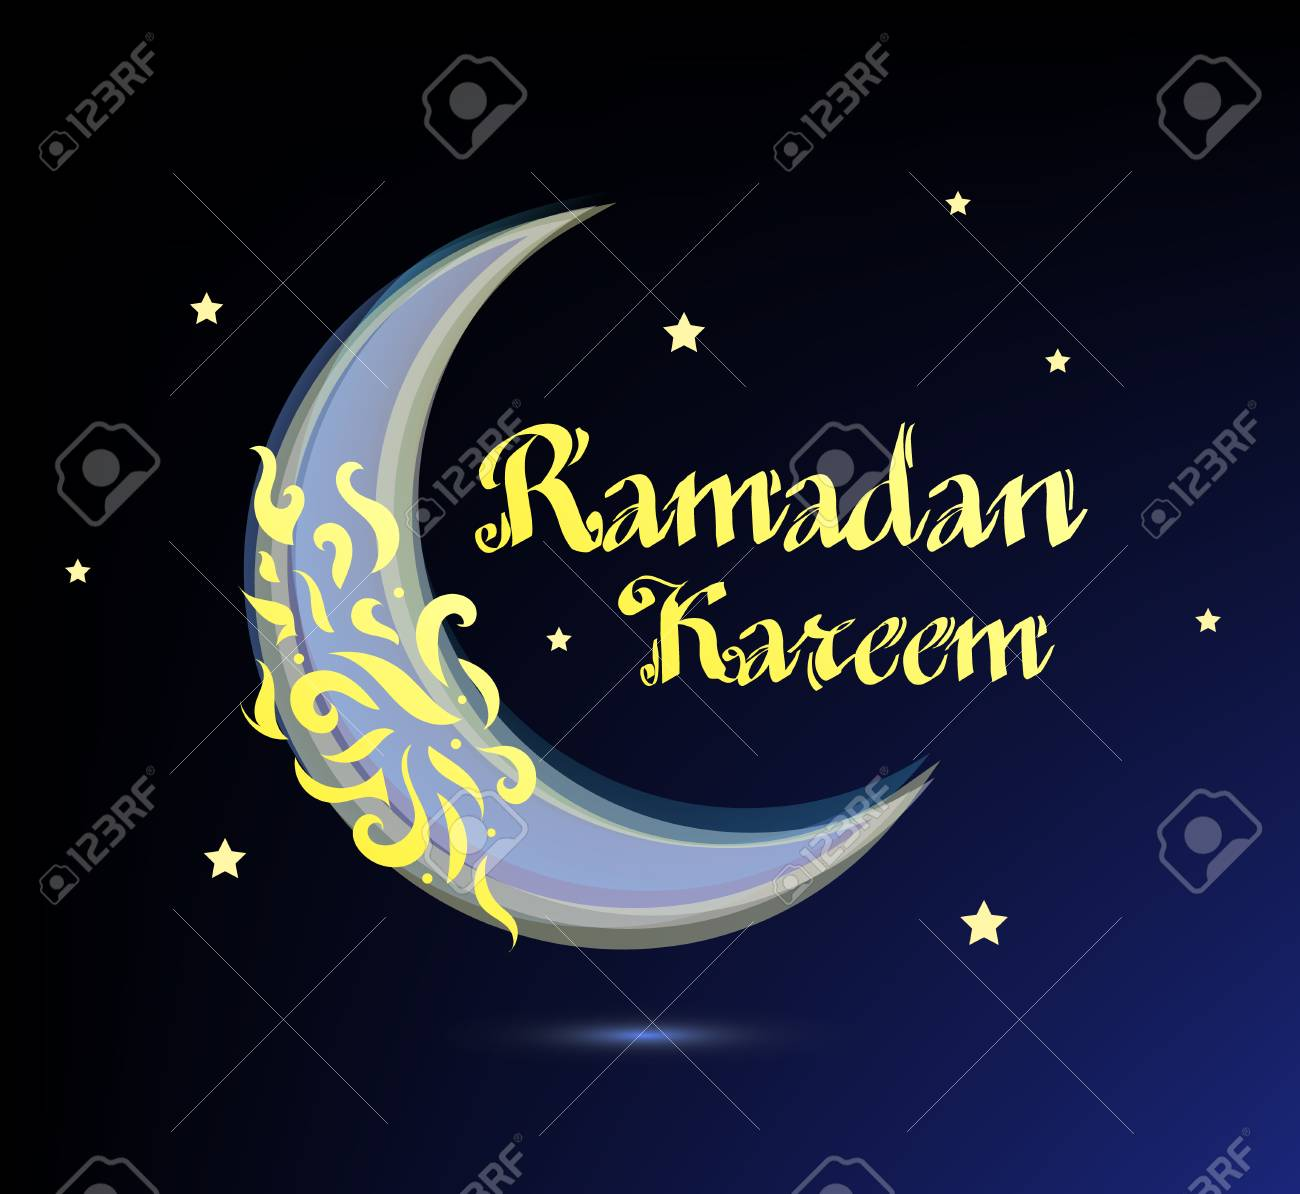 Ramadan Greetings NEW Holiday Season Celebration POSTER